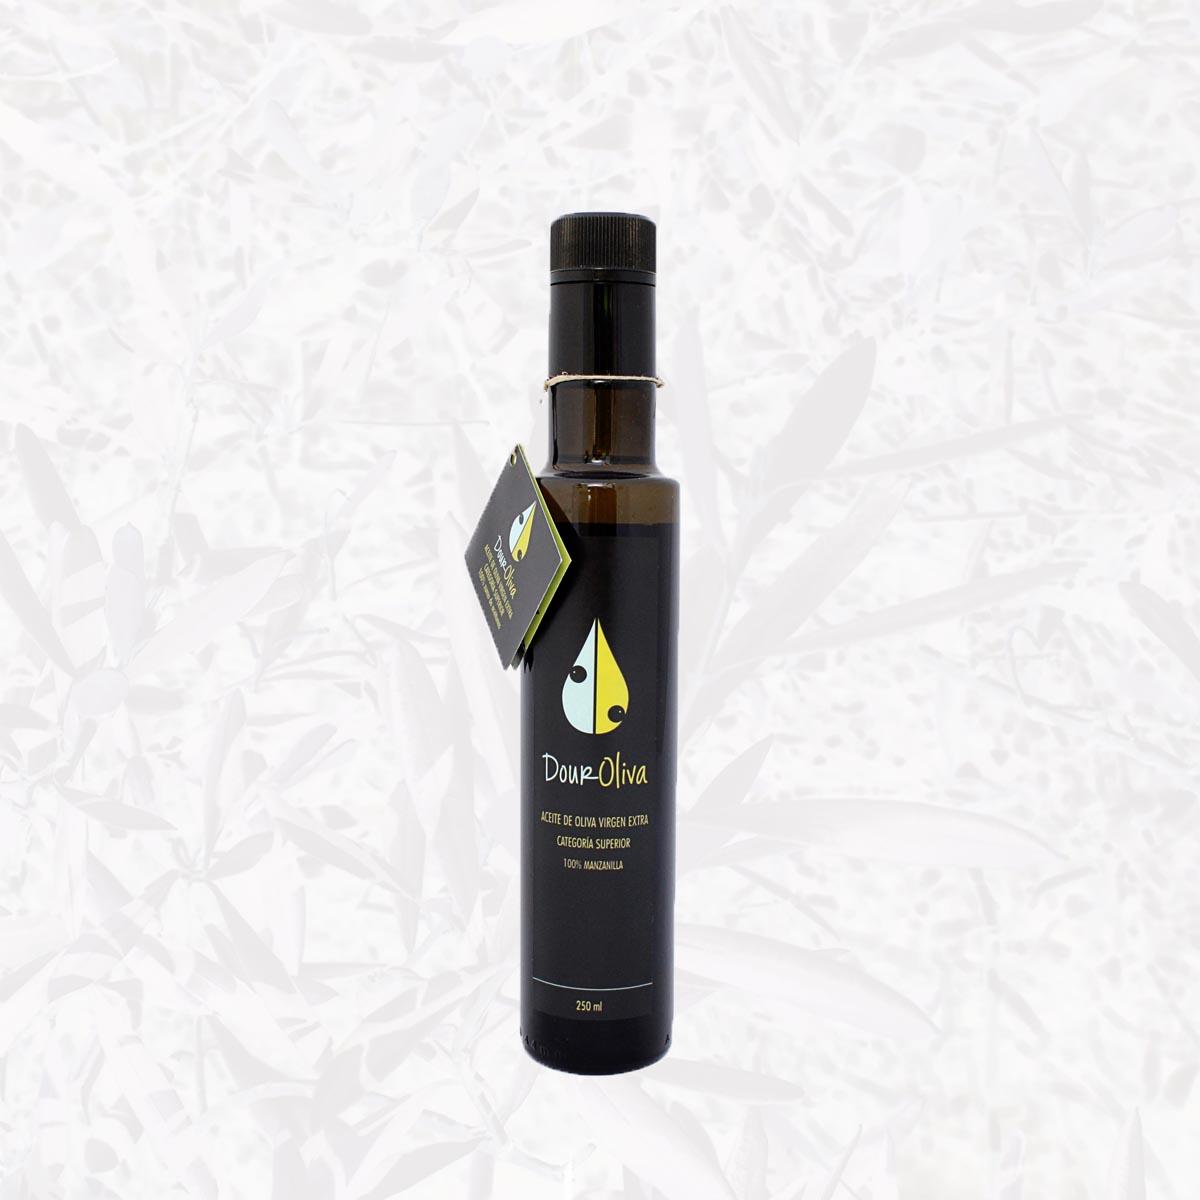 DourOliva-Aceite-250ml